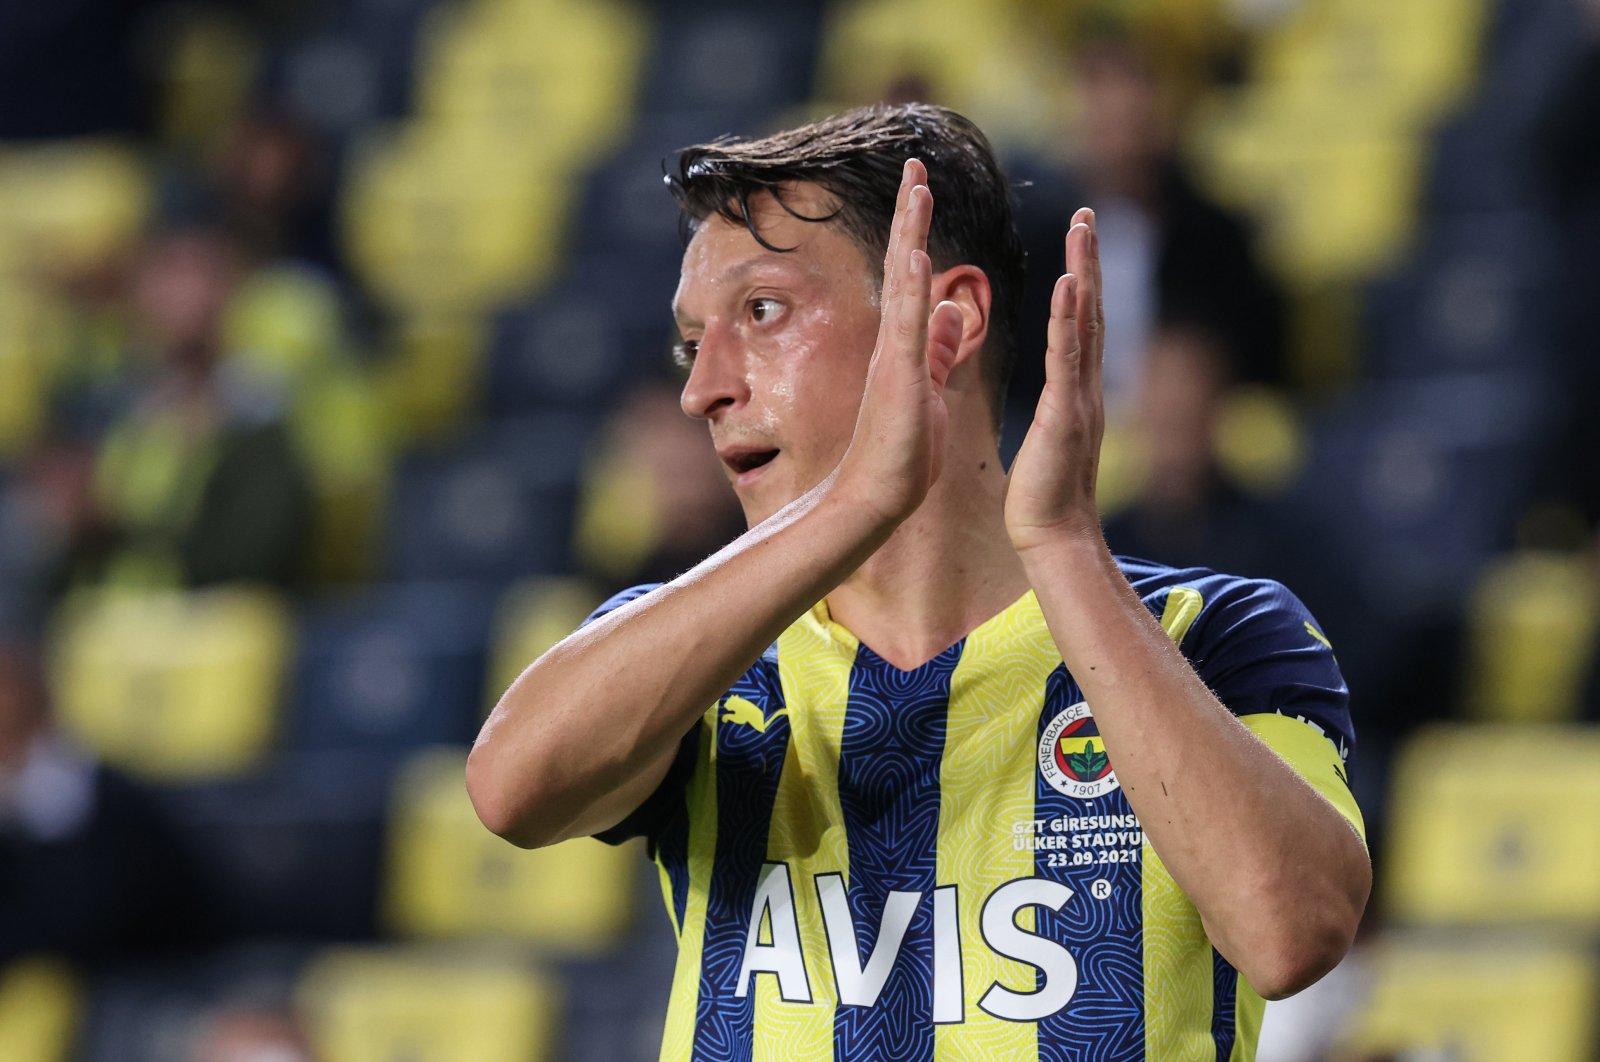 Fenerbahçe's Mesut Özil reacts during a Turkish Süper Lig match against Giresunspor at Şükrü Saraçoğlu Stadium, in Istanbul, Turkey, Sept. 23, 2021. (AA Photo)